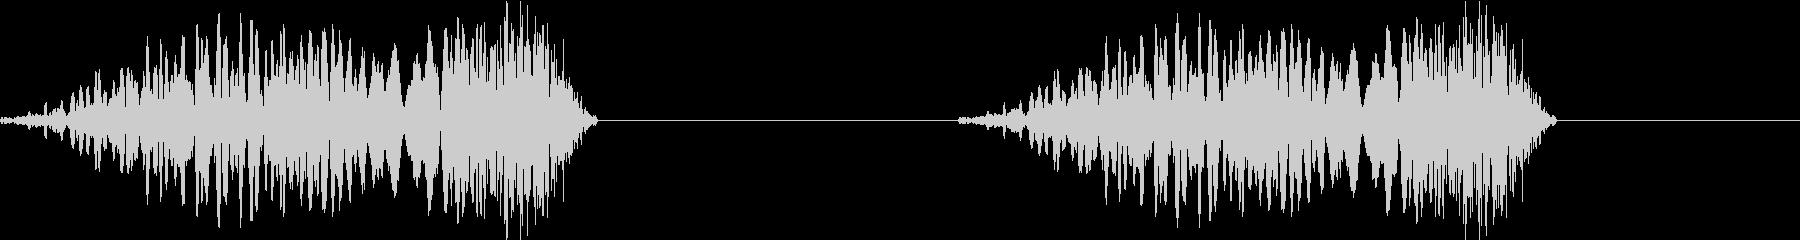 DJプレイ スクラッチ・ノイズ 175の未再生の波形